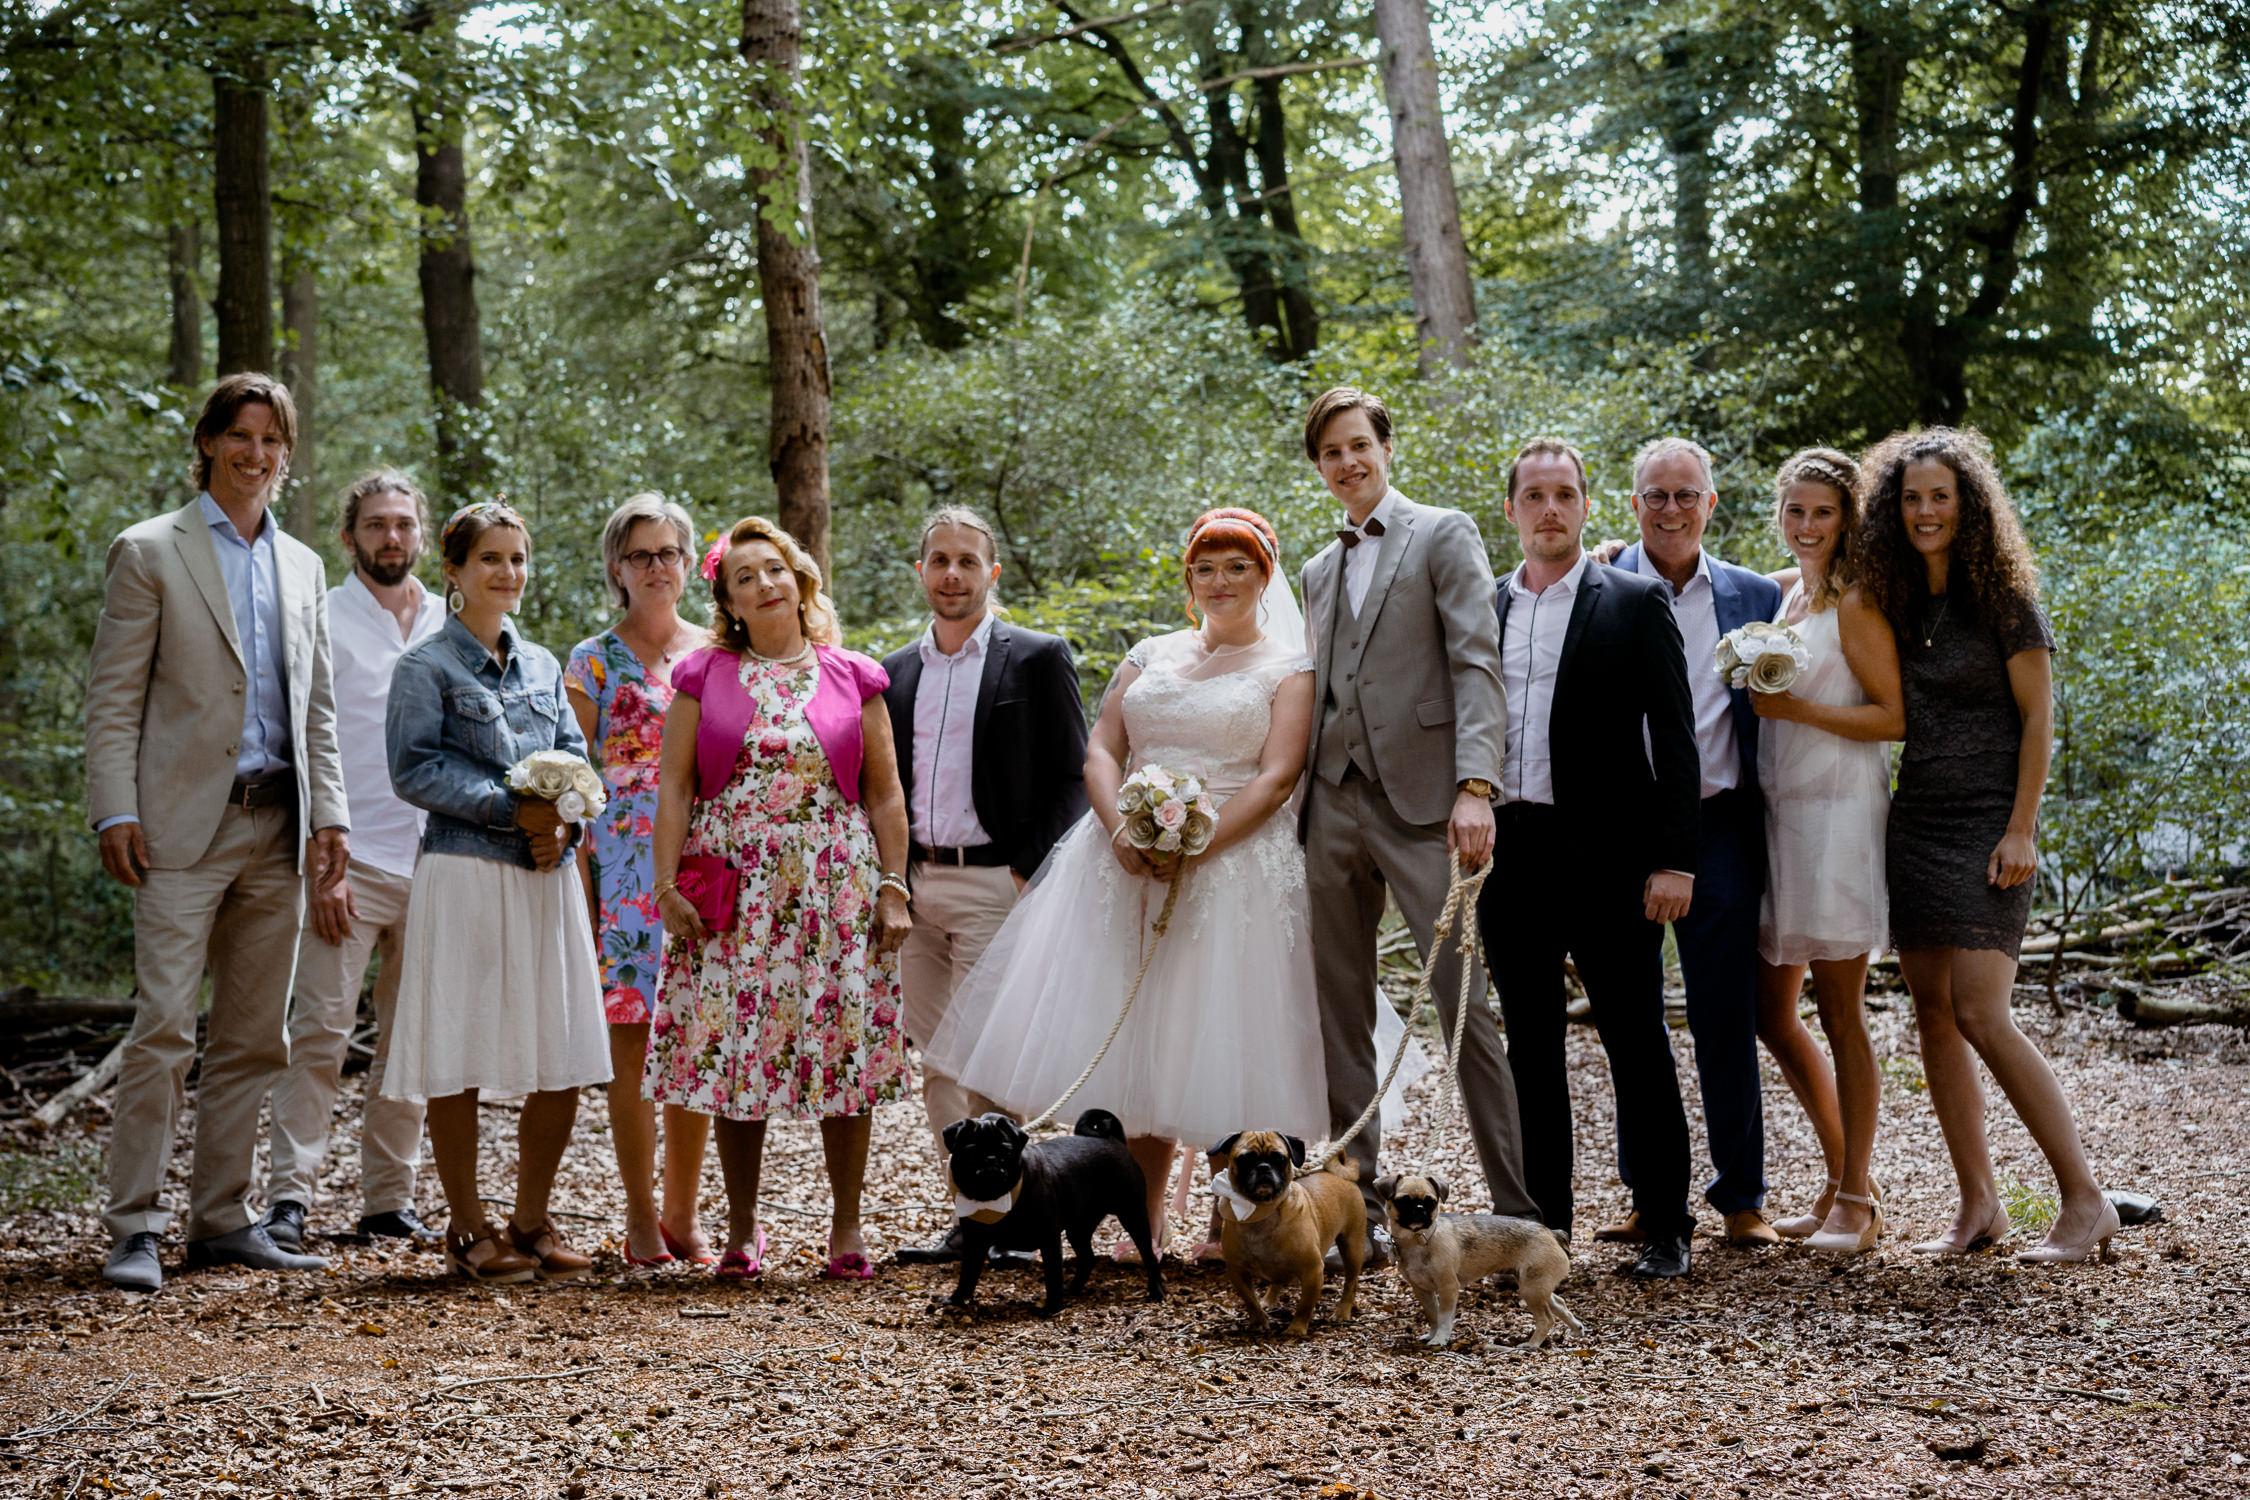 amsterdam-wedding-photographer-bruidsfotografie-trouwfotograaf-mark-hadden-Lucie-Luuk-203.jpg